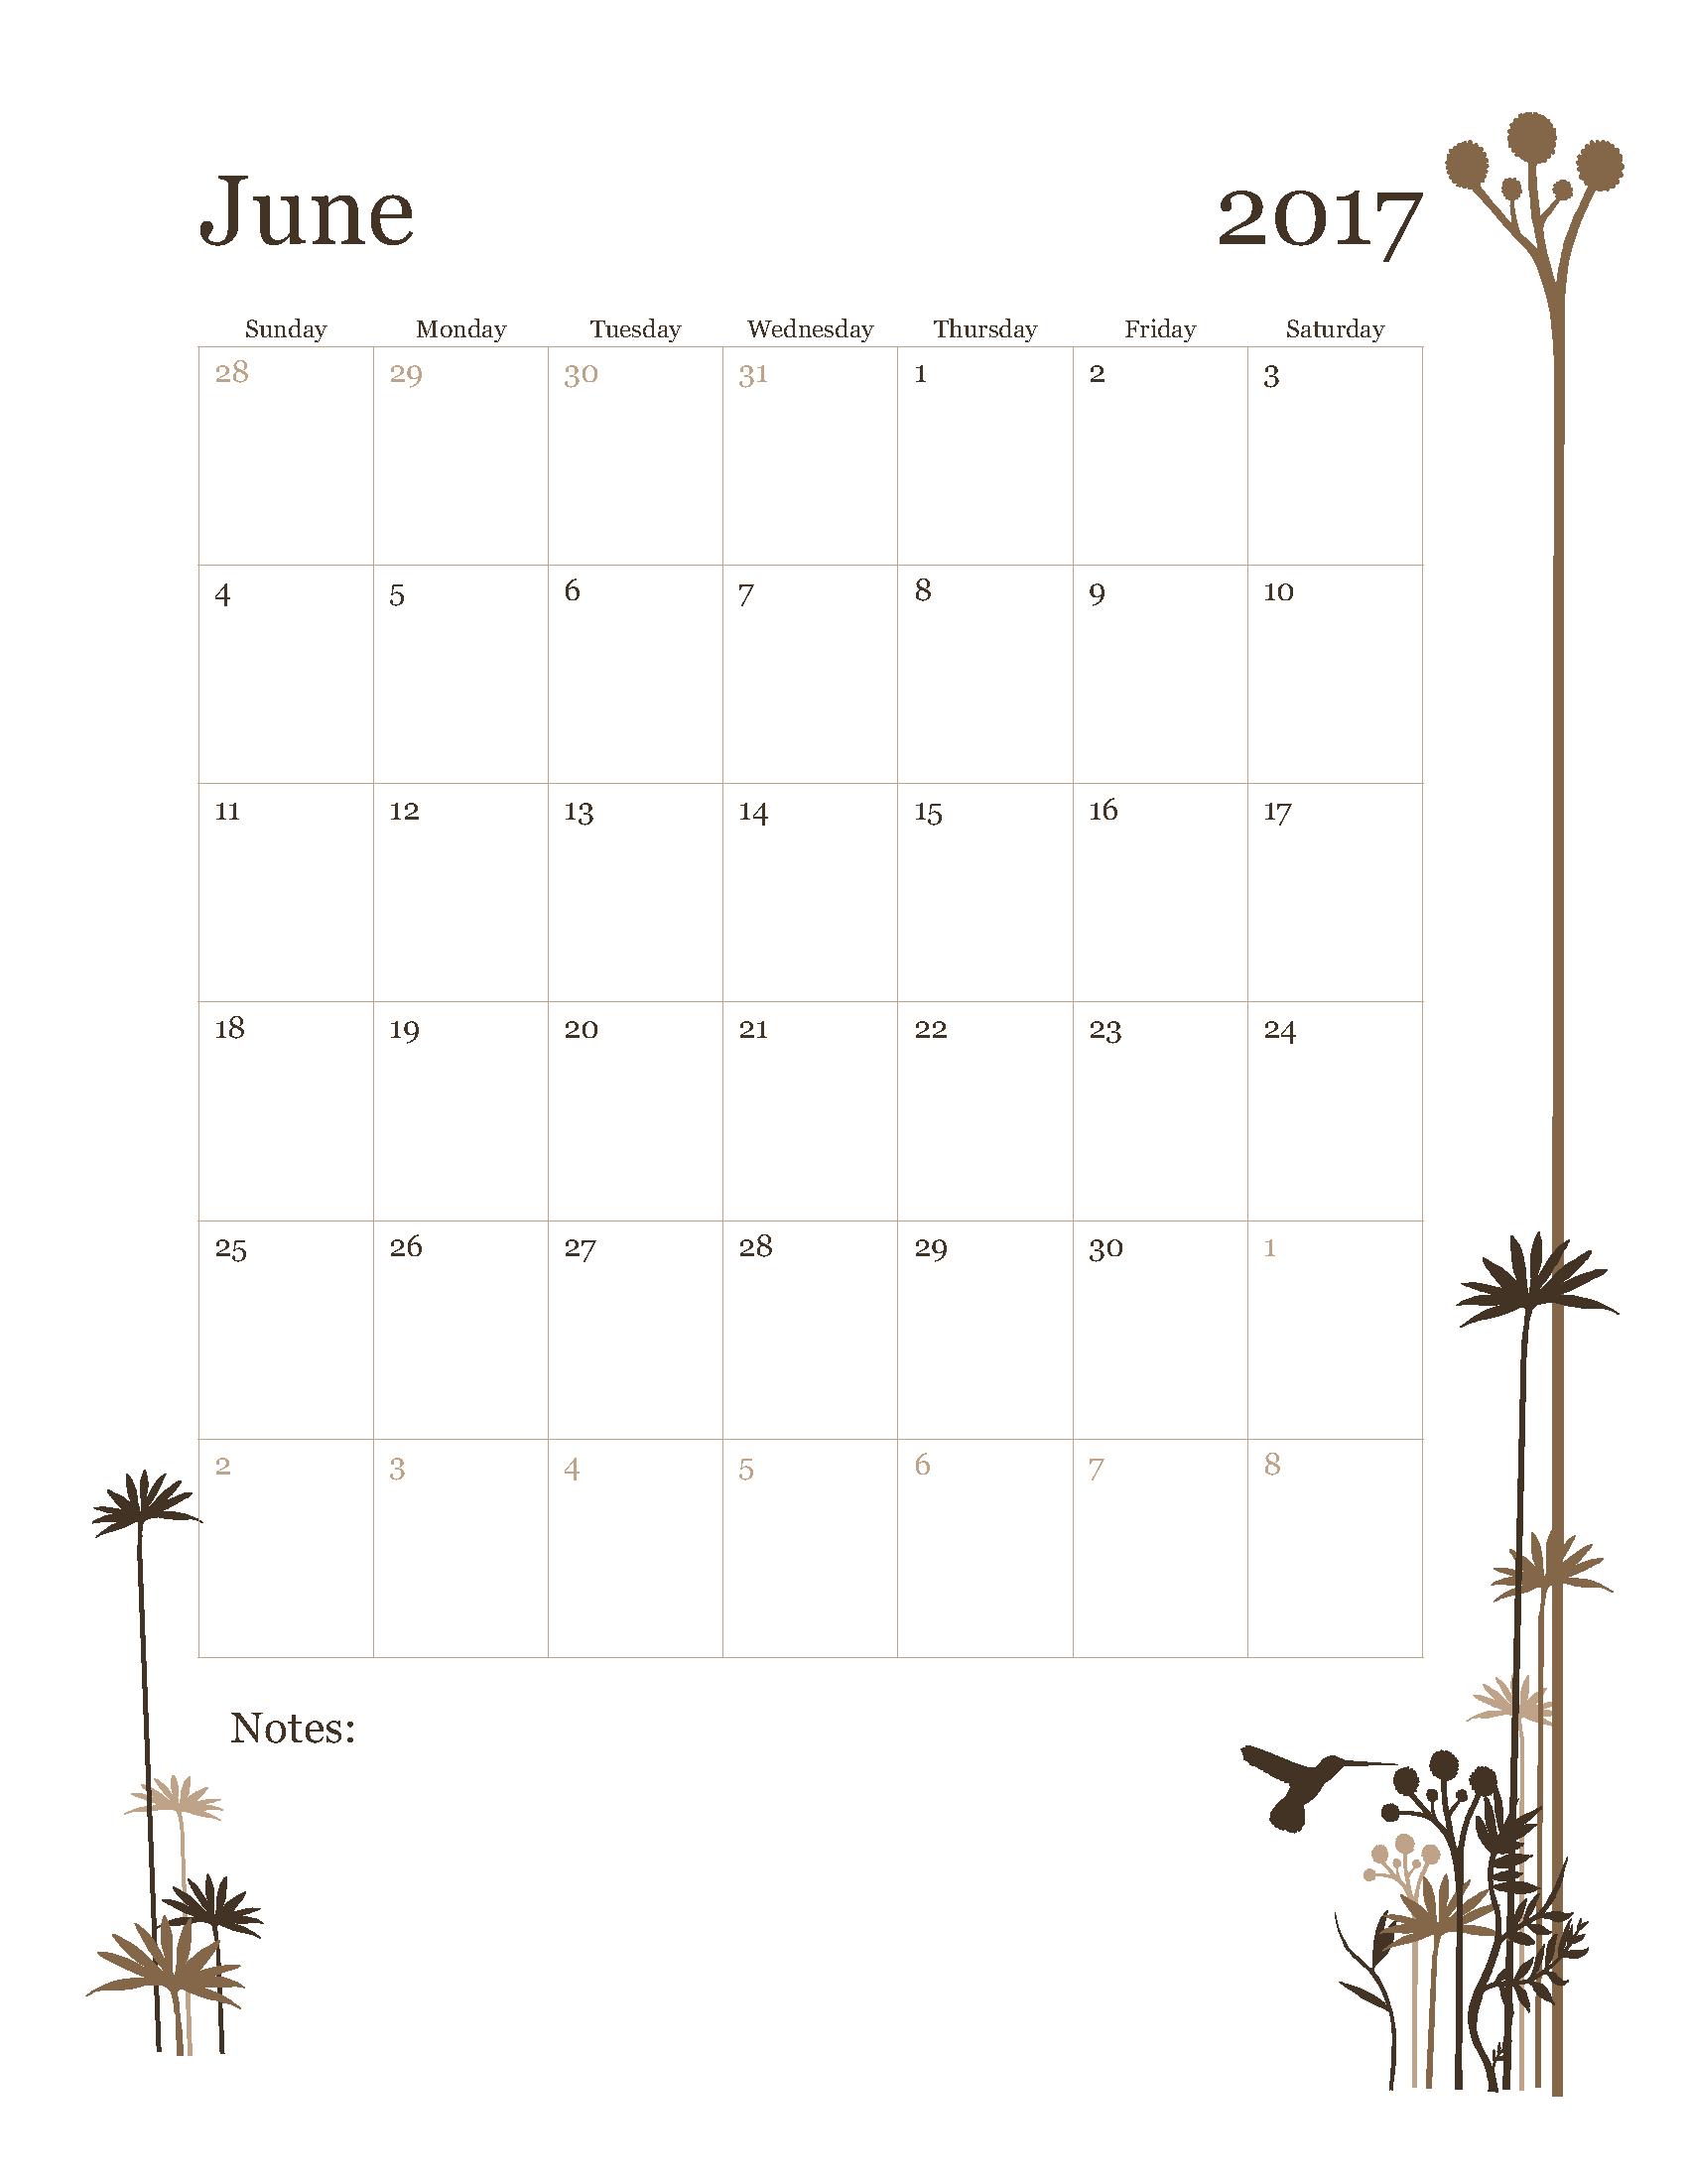 Free June 2017 Calendar Template Printable Start on Sunday - HummingBird design